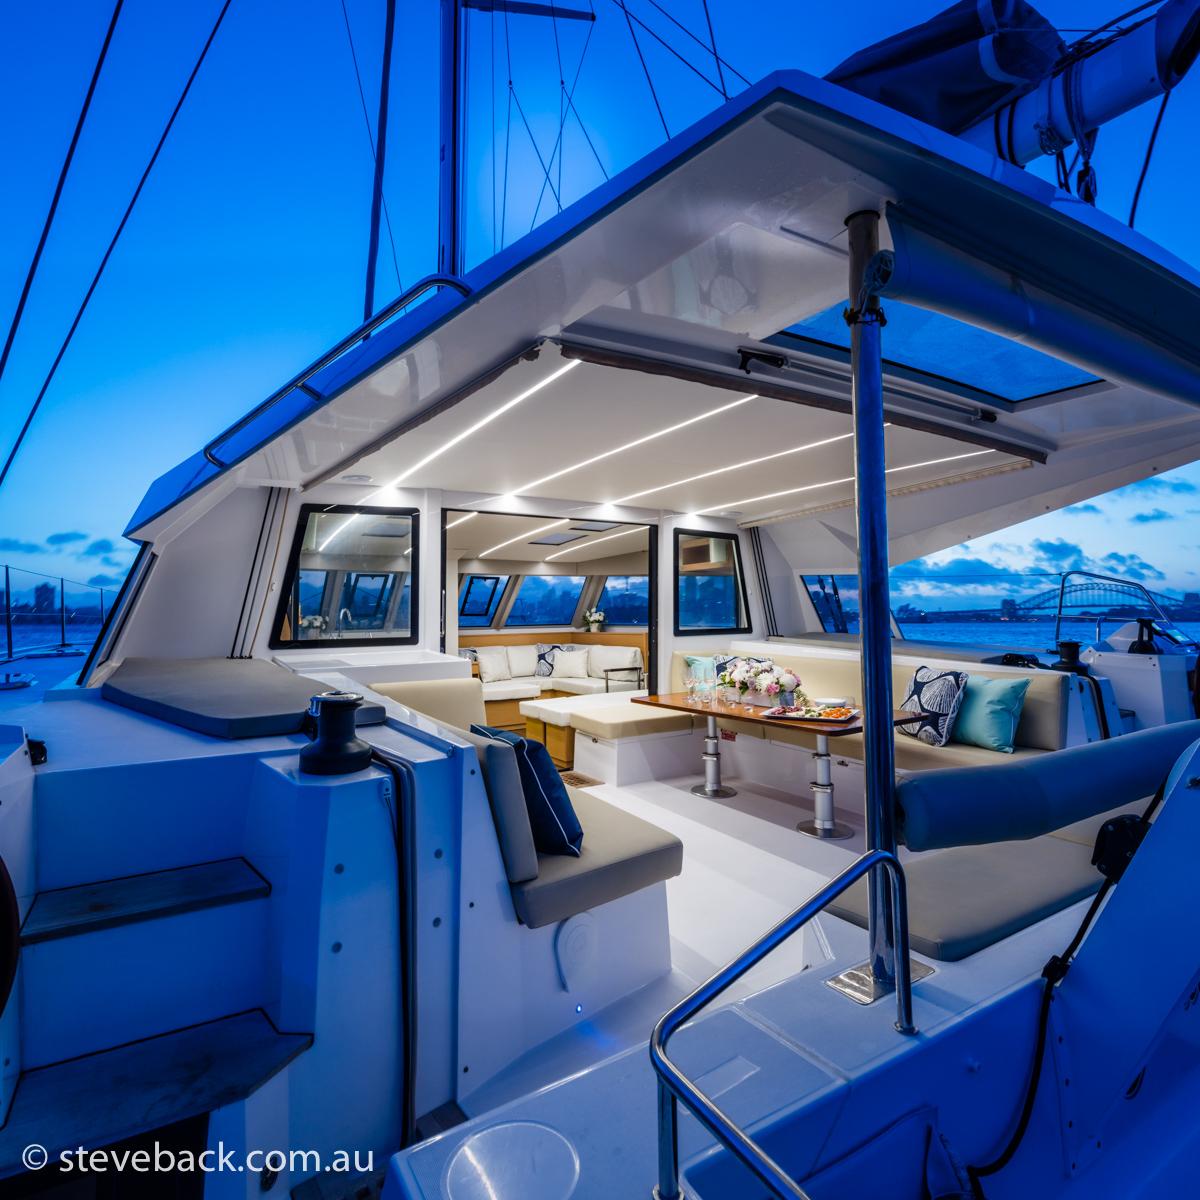 Anyboat-catamaran-Nordic-dream-maritime-boat-photography-02.jpg